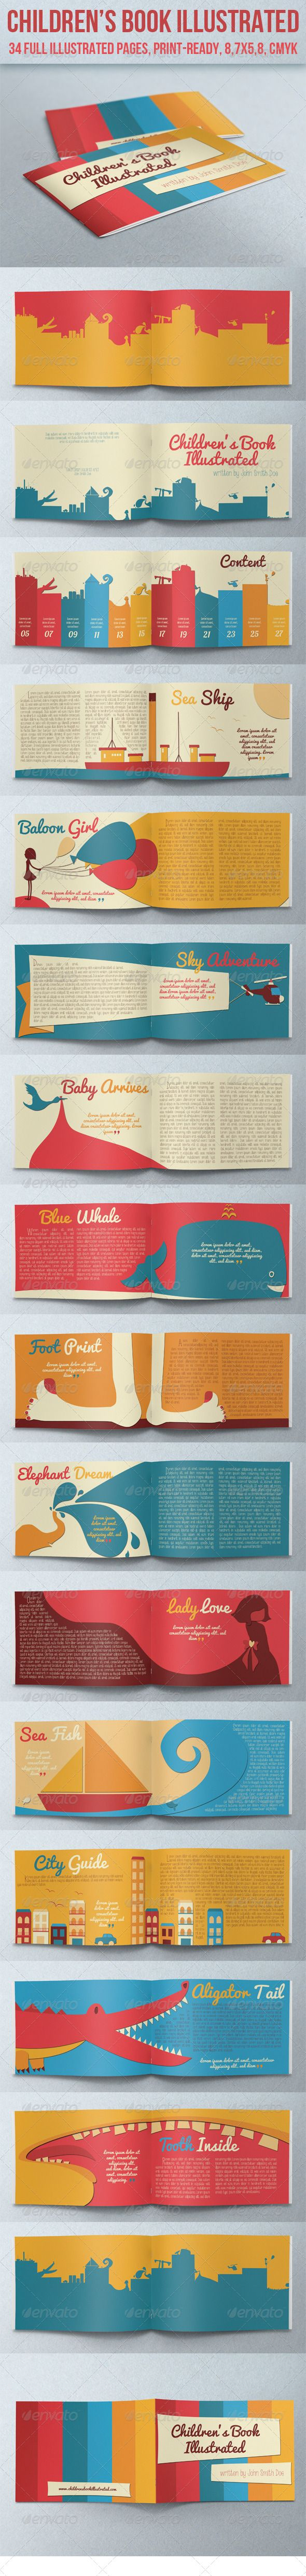 Children's Book Illustrated - Miscellaneous Print Templates